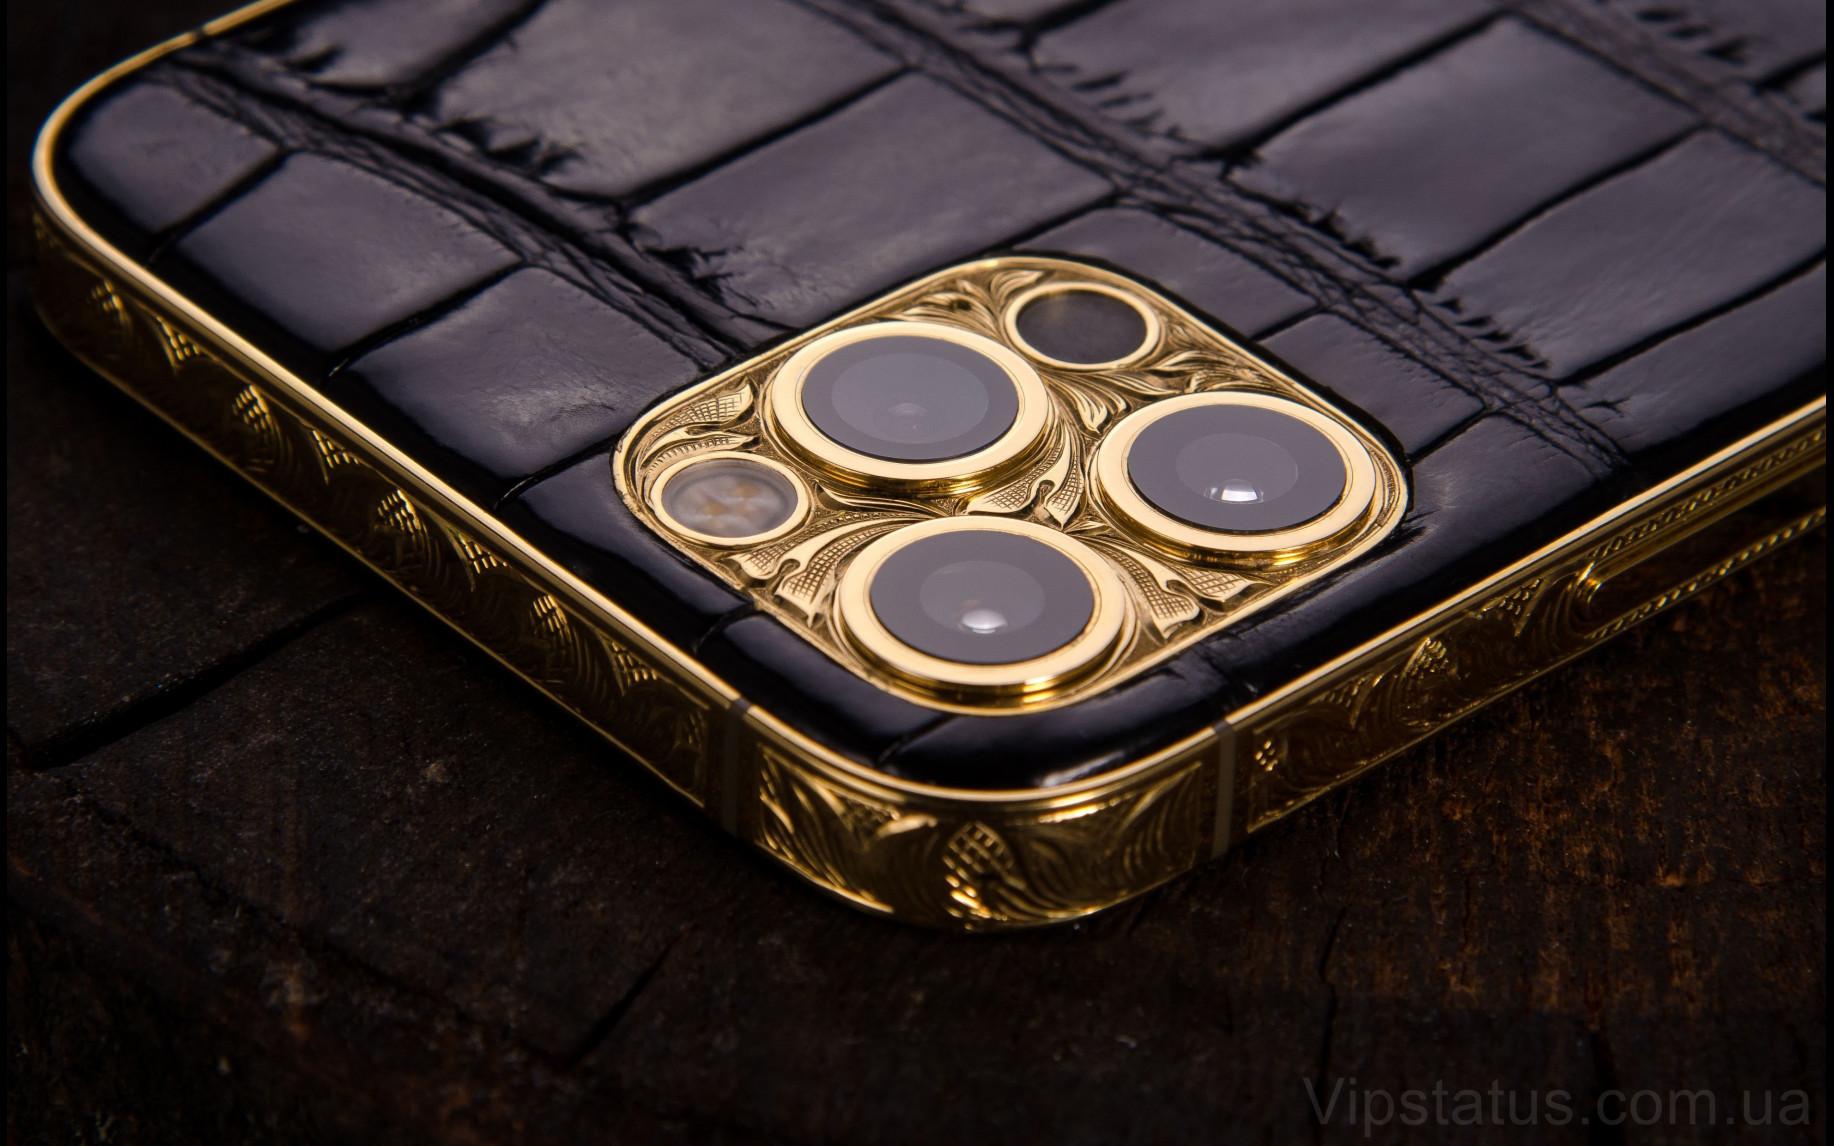 Elite Gold Edition IPHONE 12 PRO MAX 512 GB Gold Edition IPHONE 12 PRO MAX 512 GB image 3